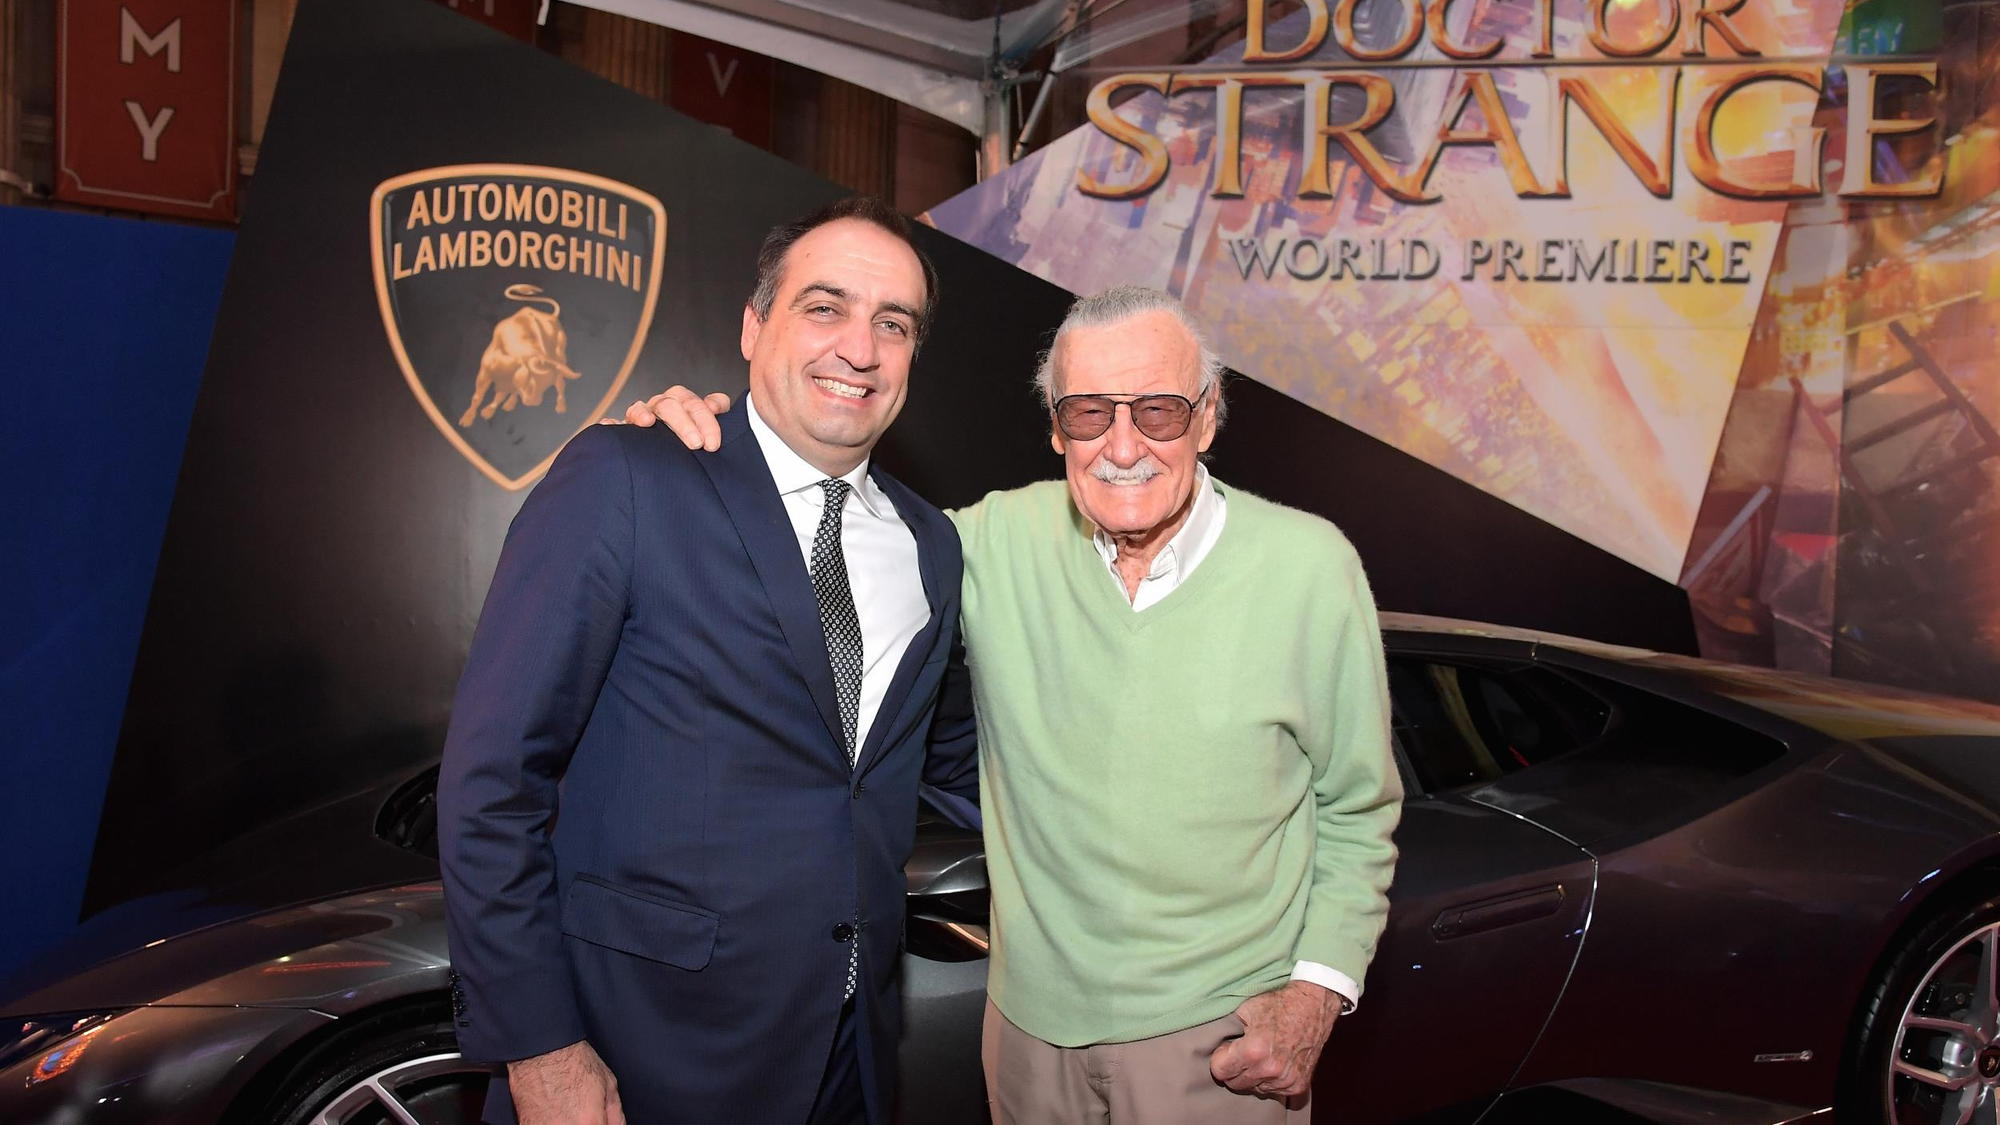 Lamborghini Huracan stars in new Marvel film Dr. Strange